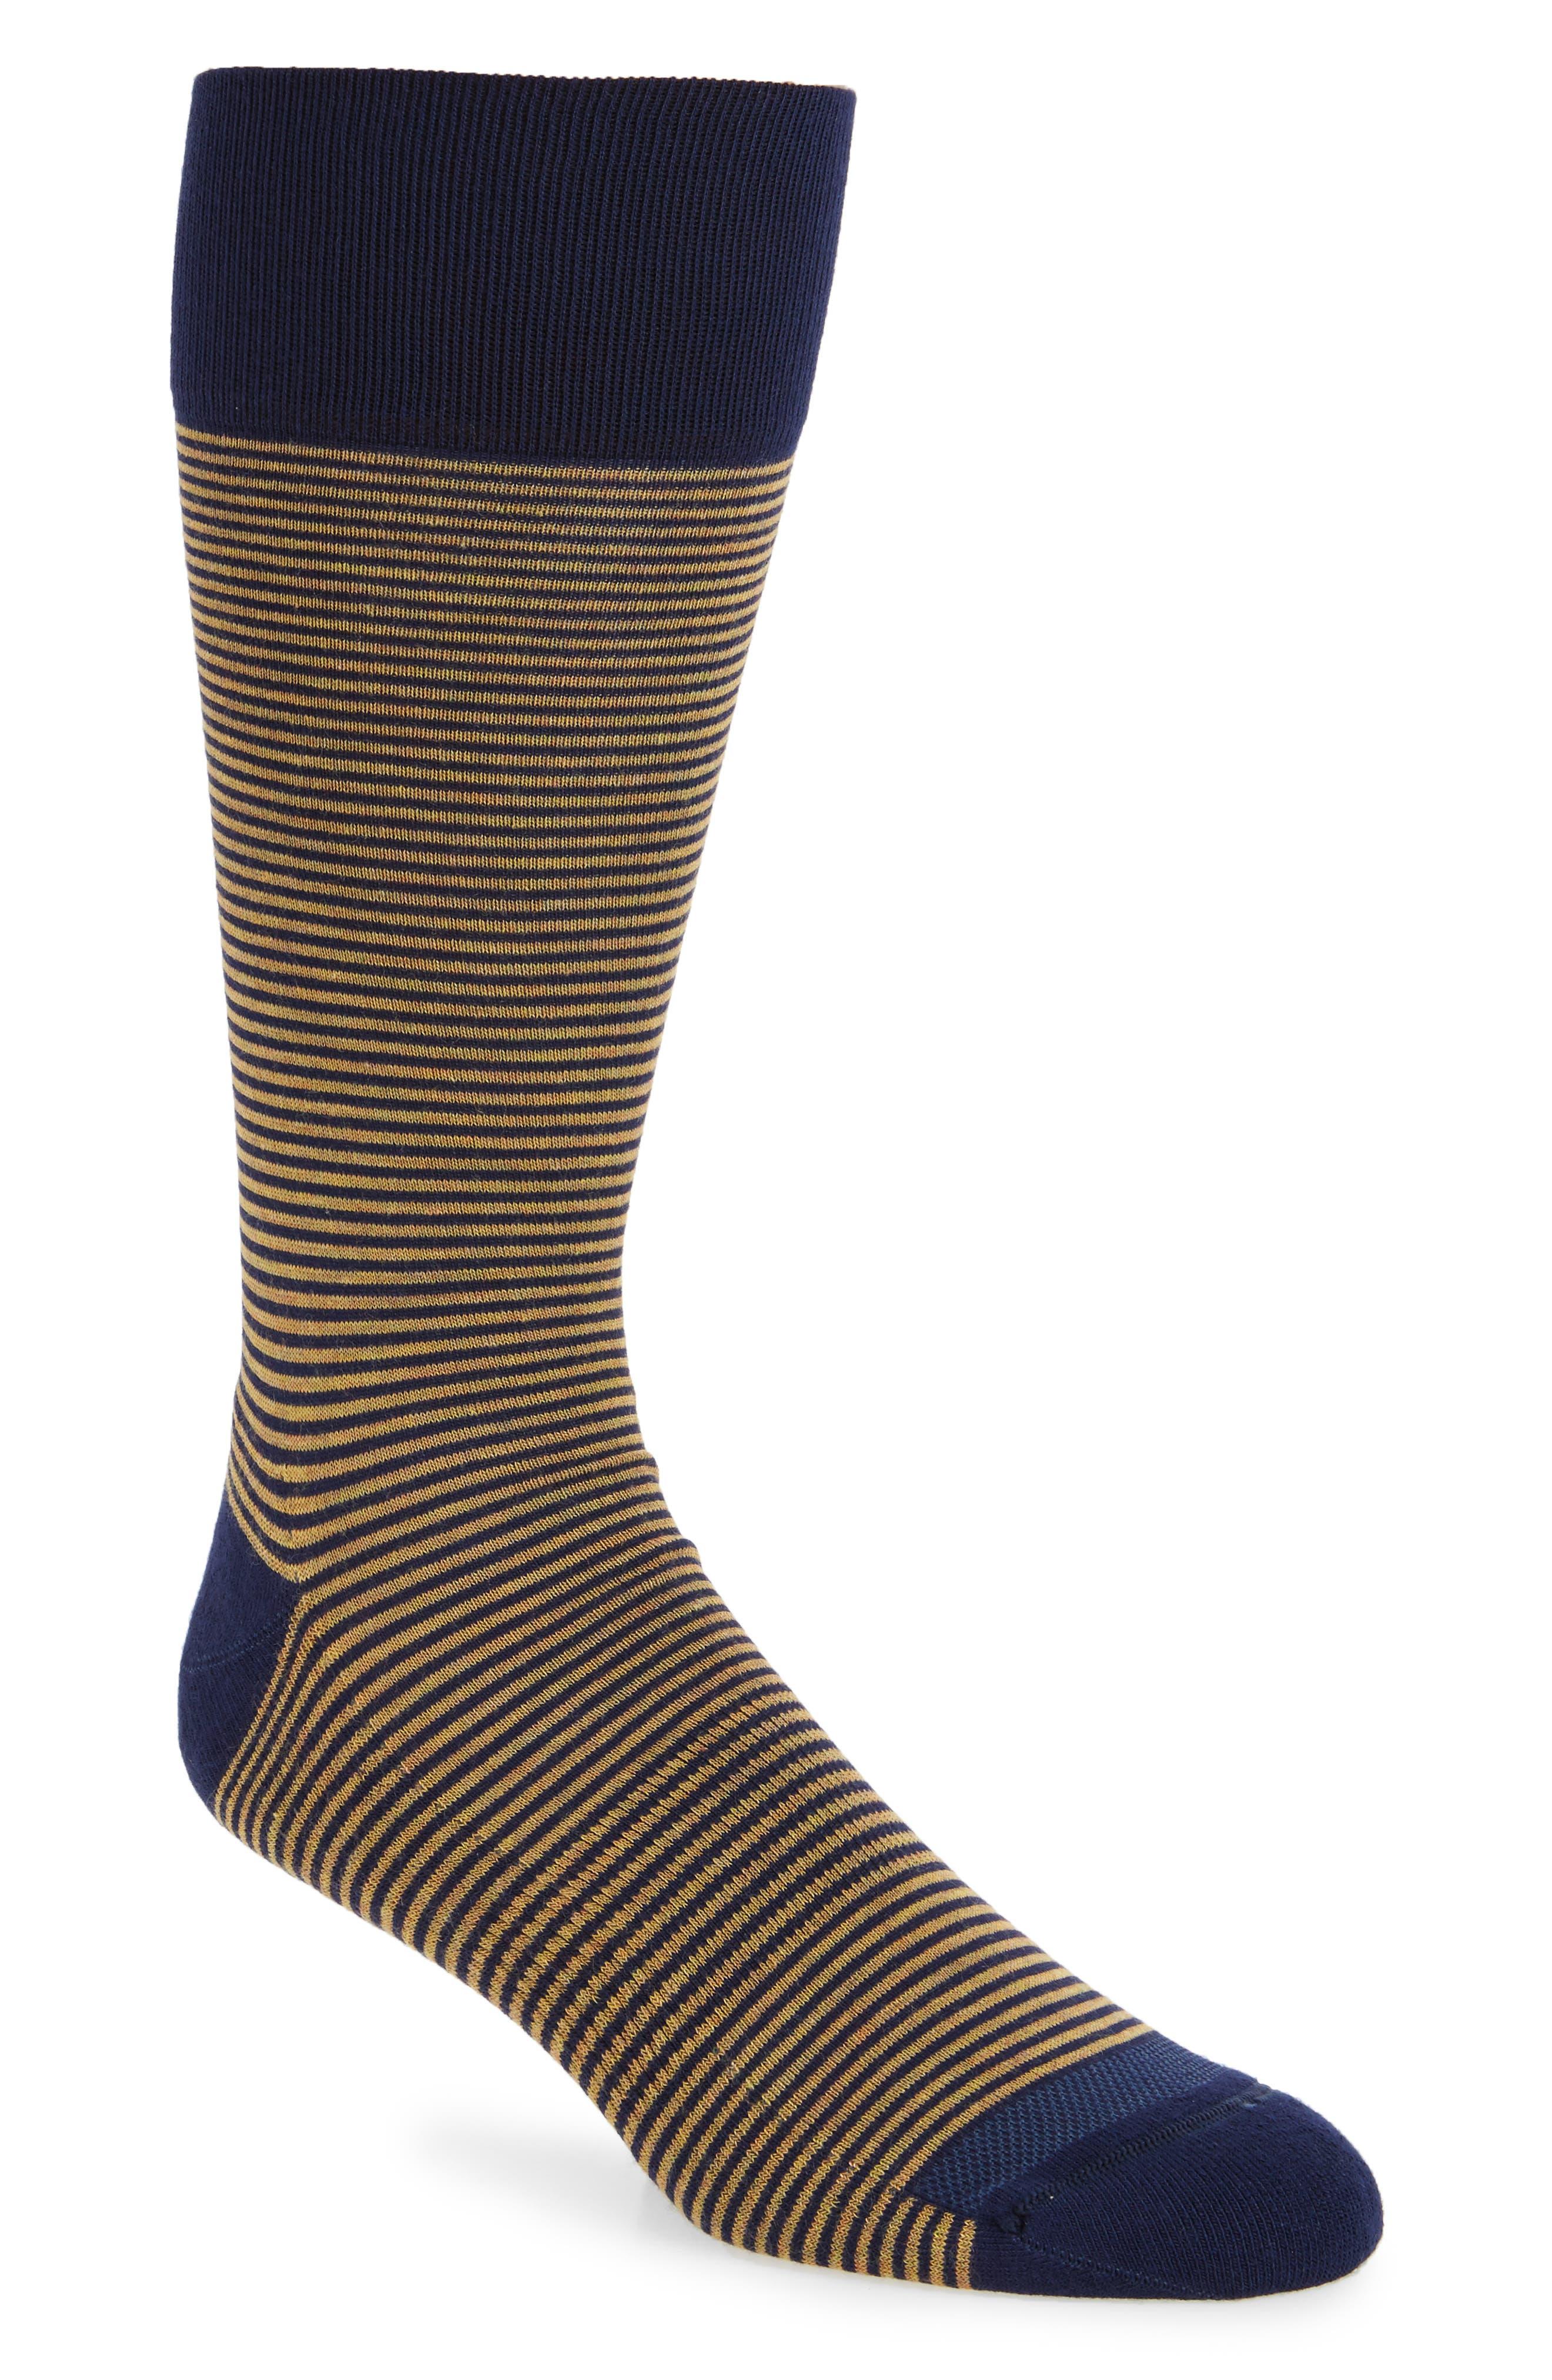 Feeder Stripe Socks,                         Main,                         color, Navy/ Gold